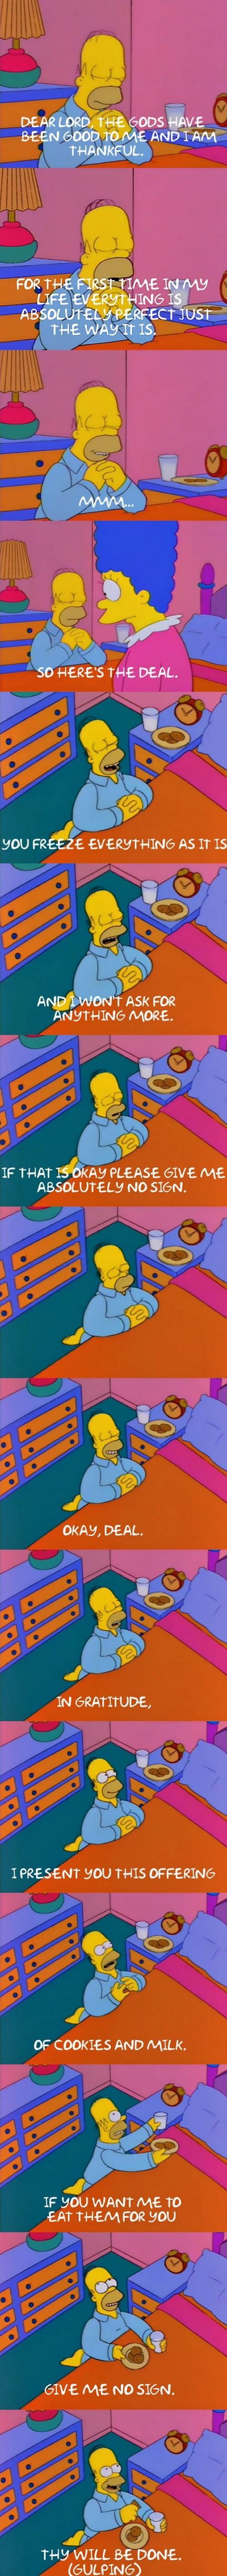 Homer's offering